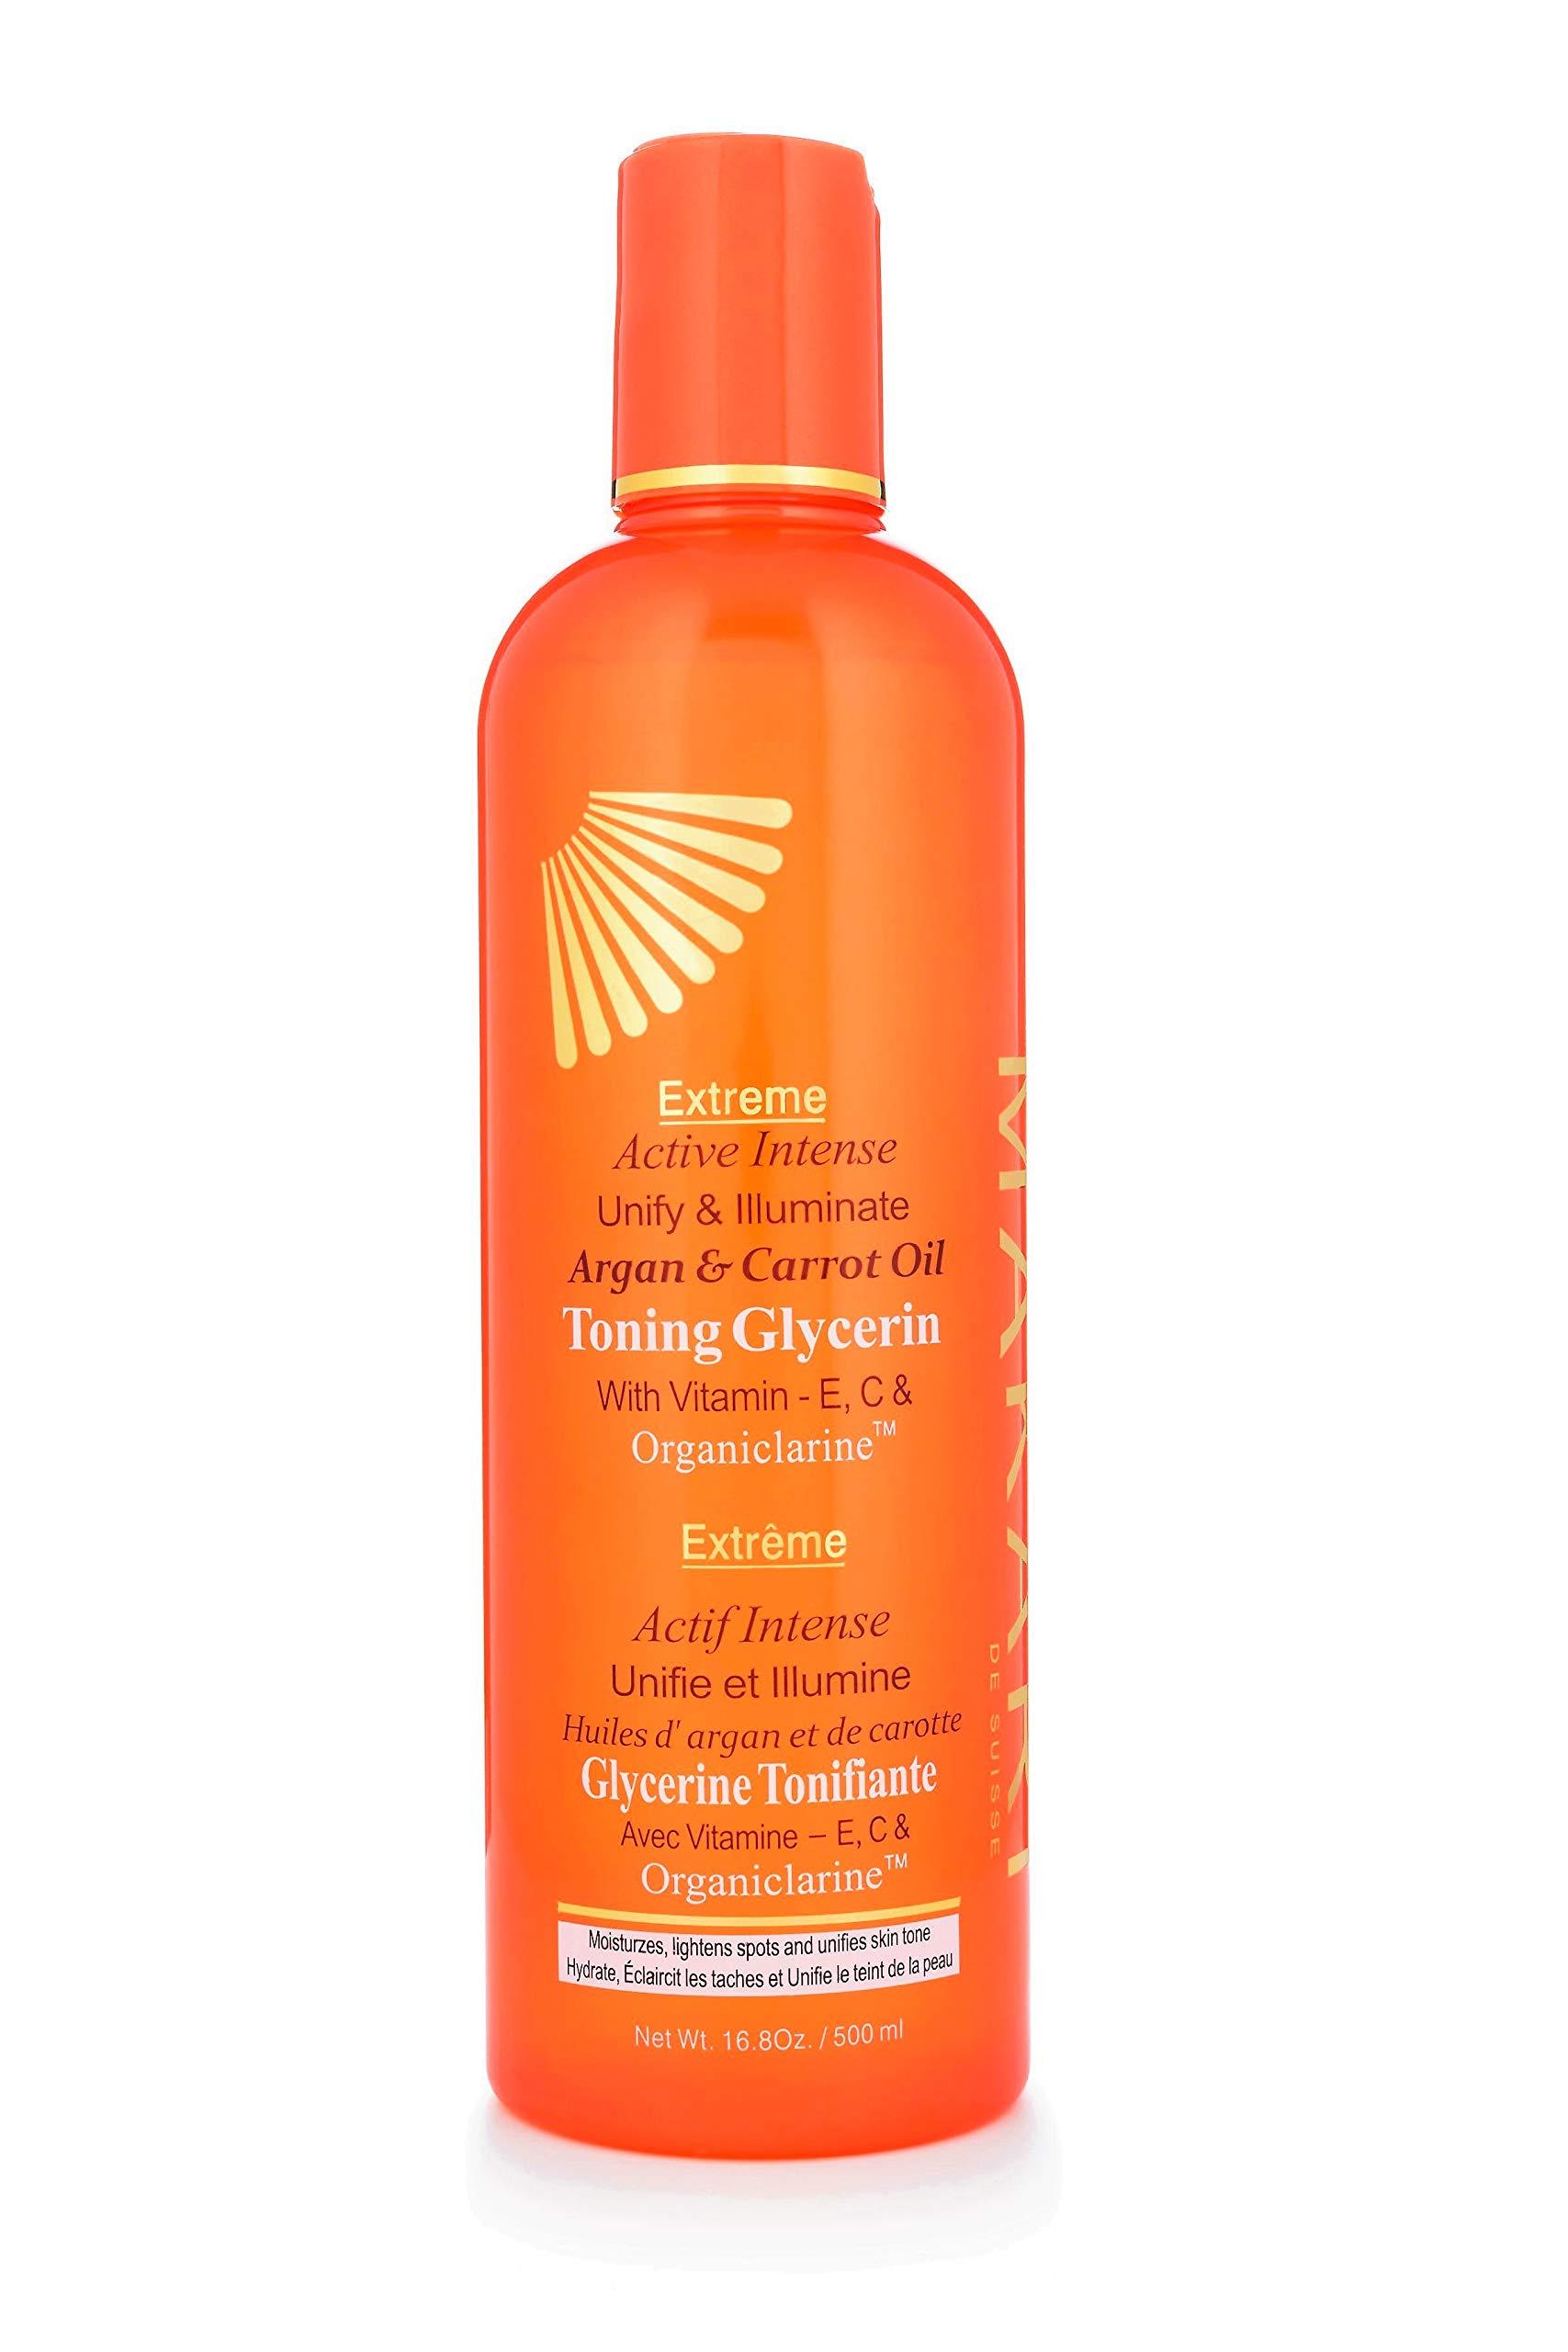 Makari Extreme Carrot & Argan Oil Skin Toning BODY Glycerin 16.8oz - Lightening & Tightening Moisturizer for Face & Body with Organiclarine - Whitening Treatment for Dark Spots, Wrinkles & Dryness